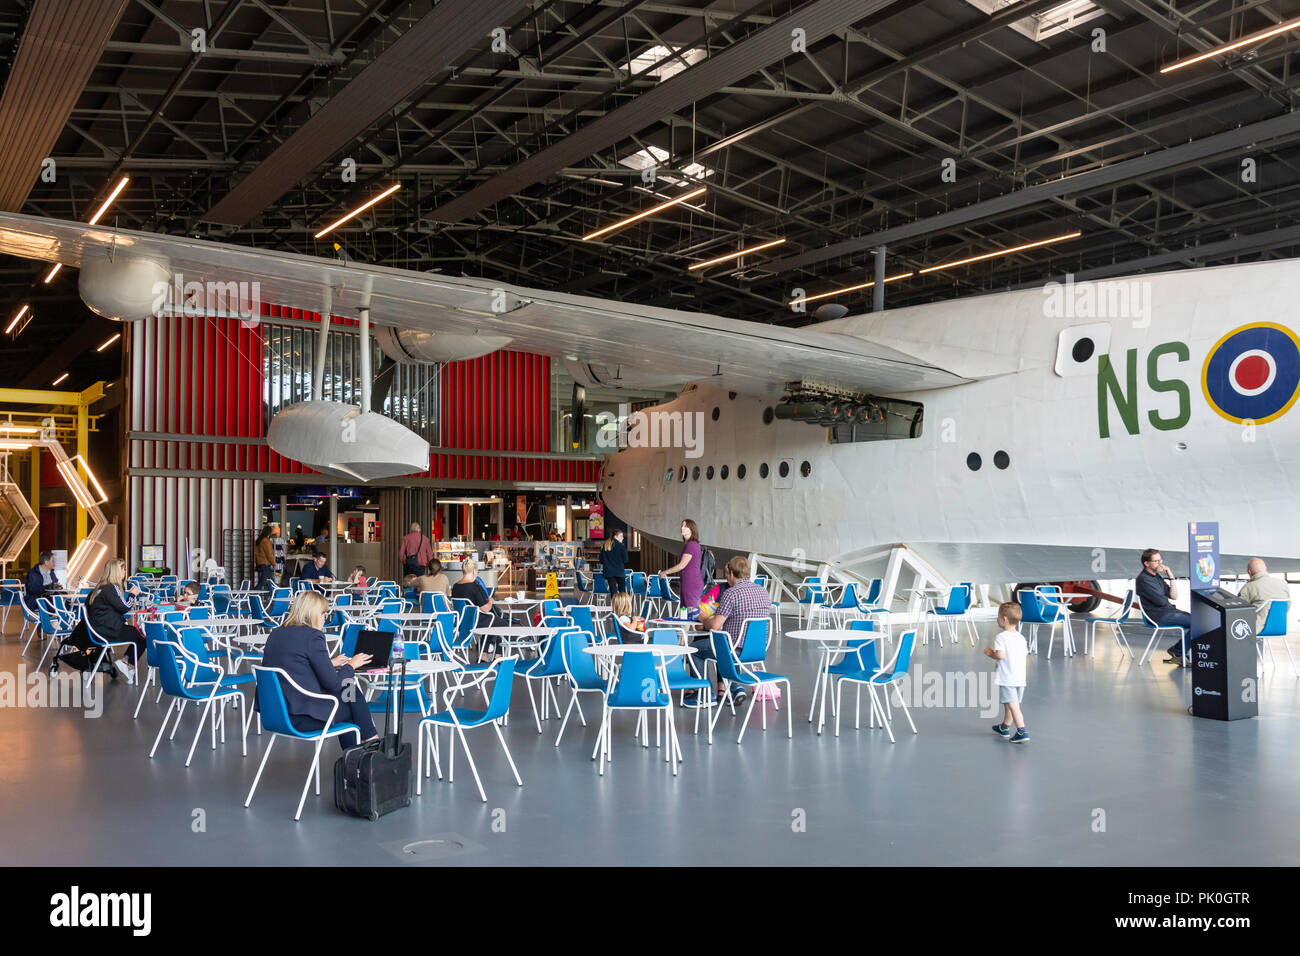 Cafe with Short Sunderland flying boat on display, Royal Air Force Museum, Colindale, London Borough of Barnet, Greater London, England, United Kingdo - Stock Image